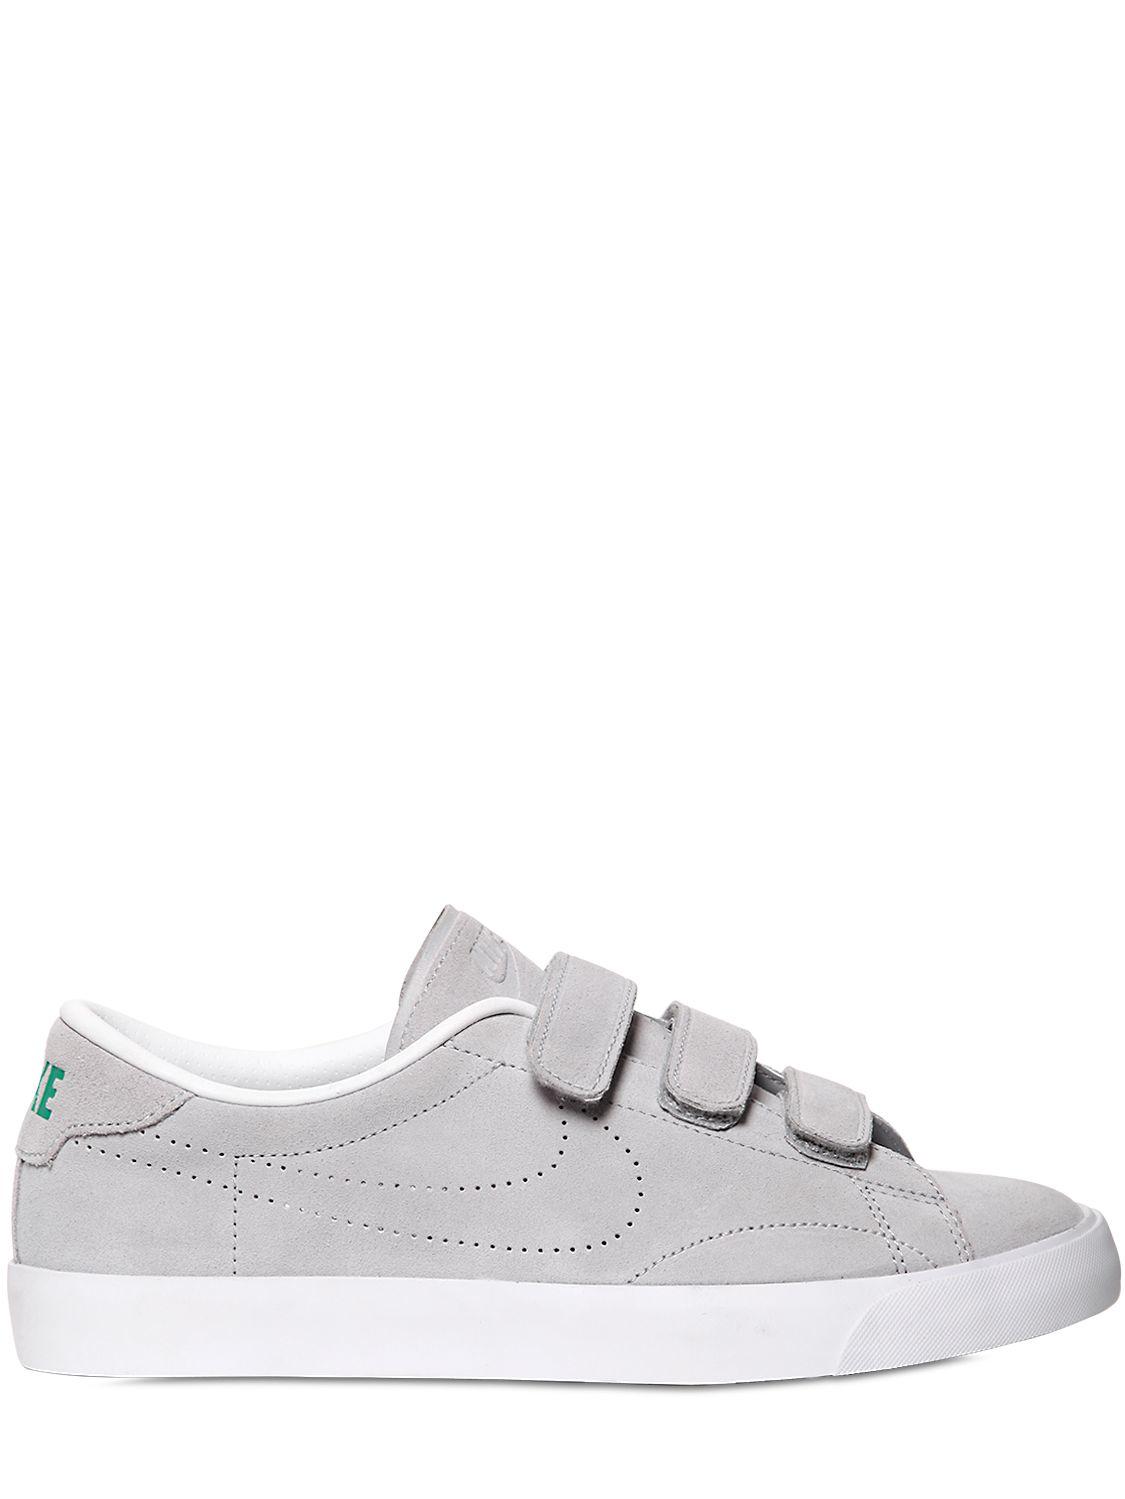 Nike Tennis Classic Nubuck Sneakers in Grey (Grey)